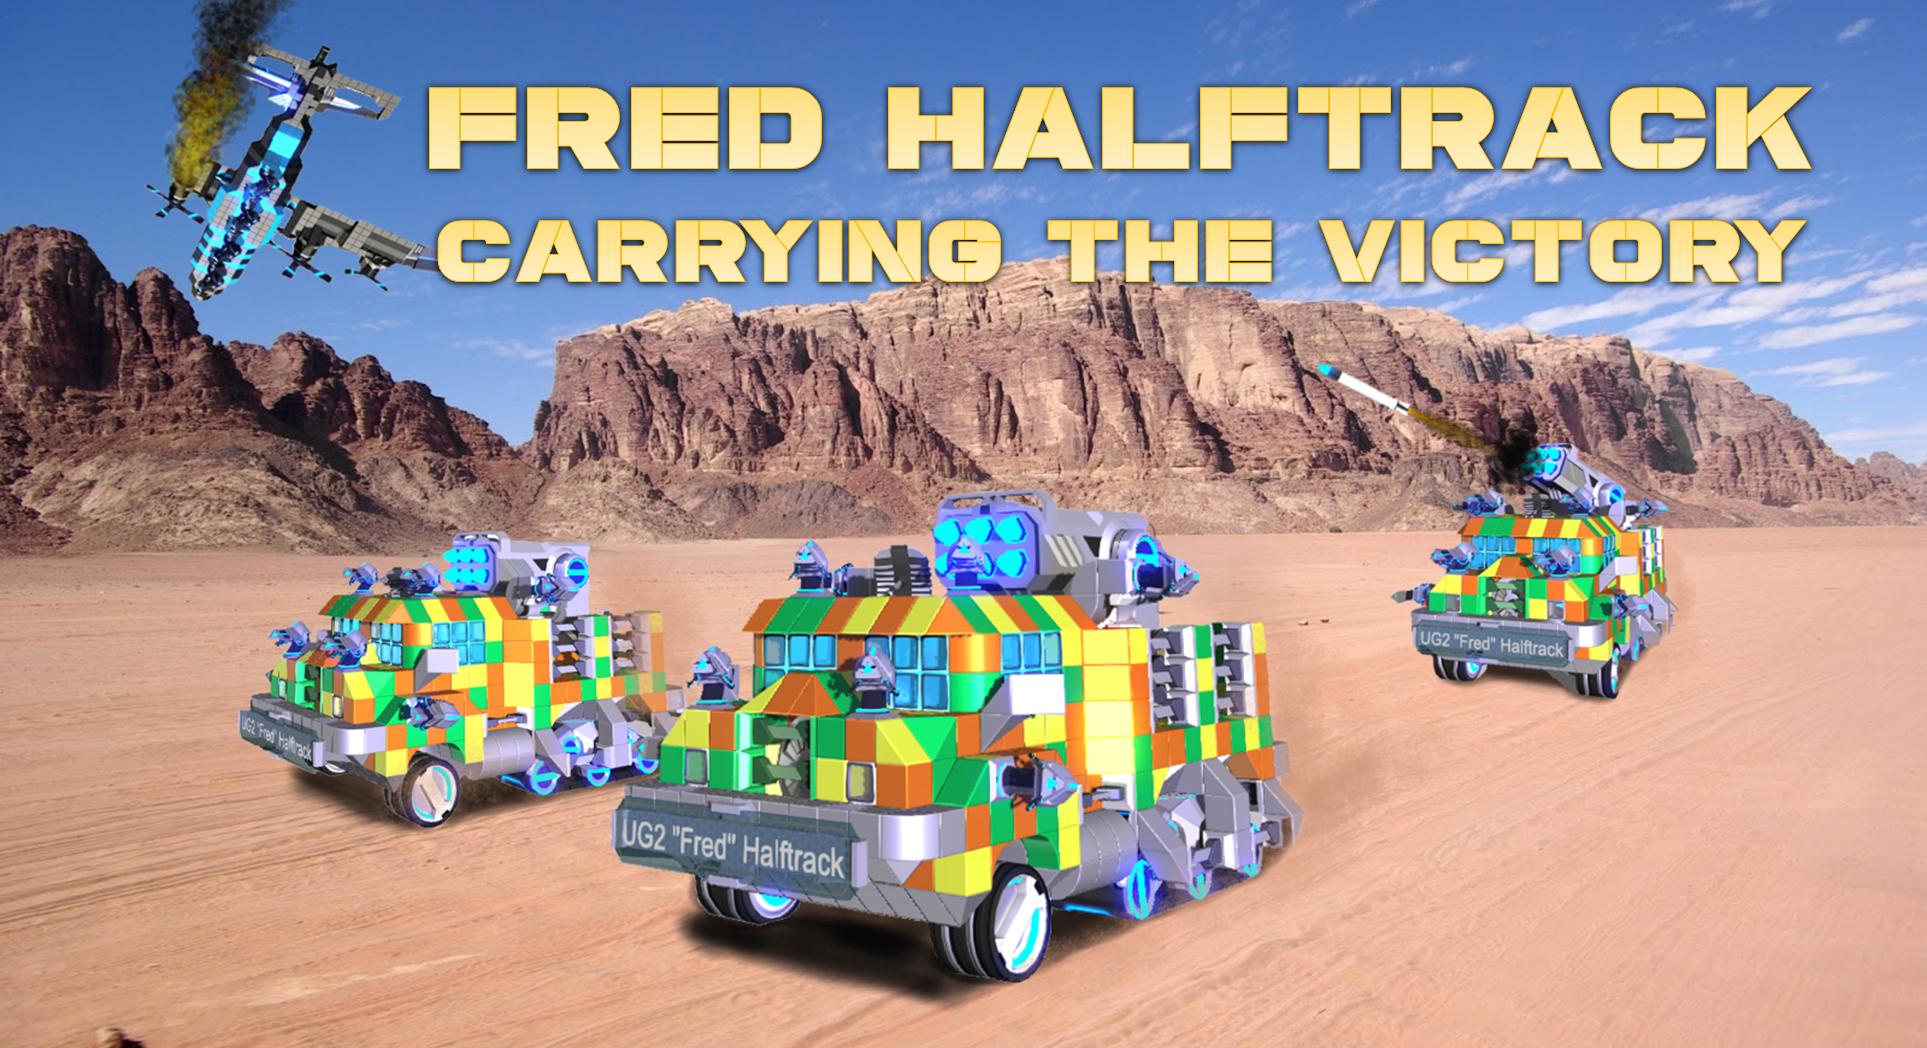 FredHalftrack